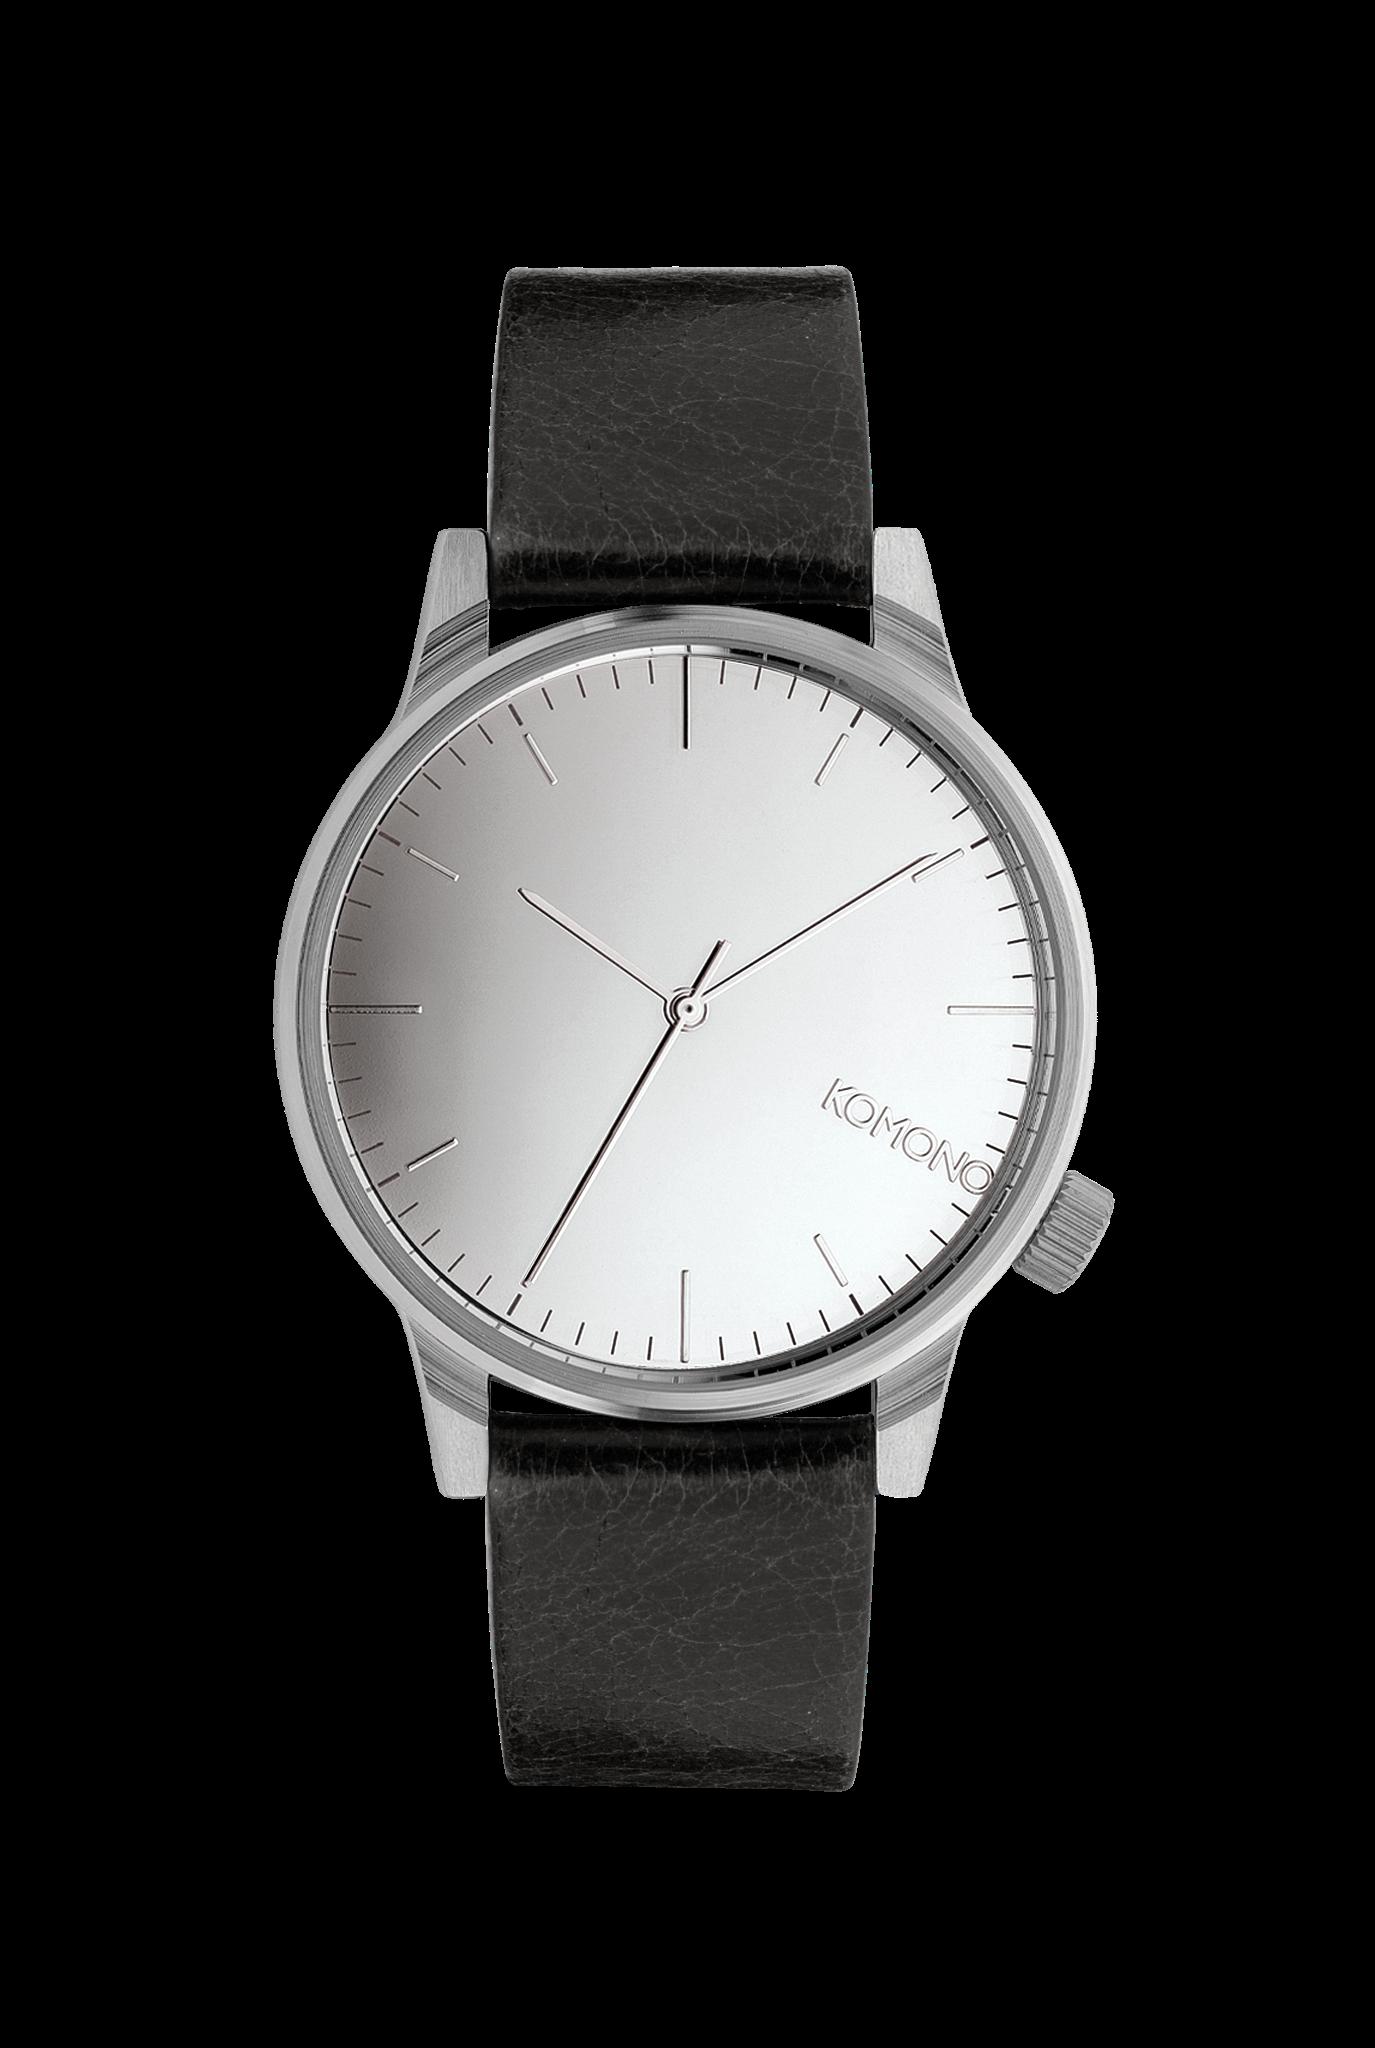 calendrier-avent-komono-watches-sunglasses-folkr-16